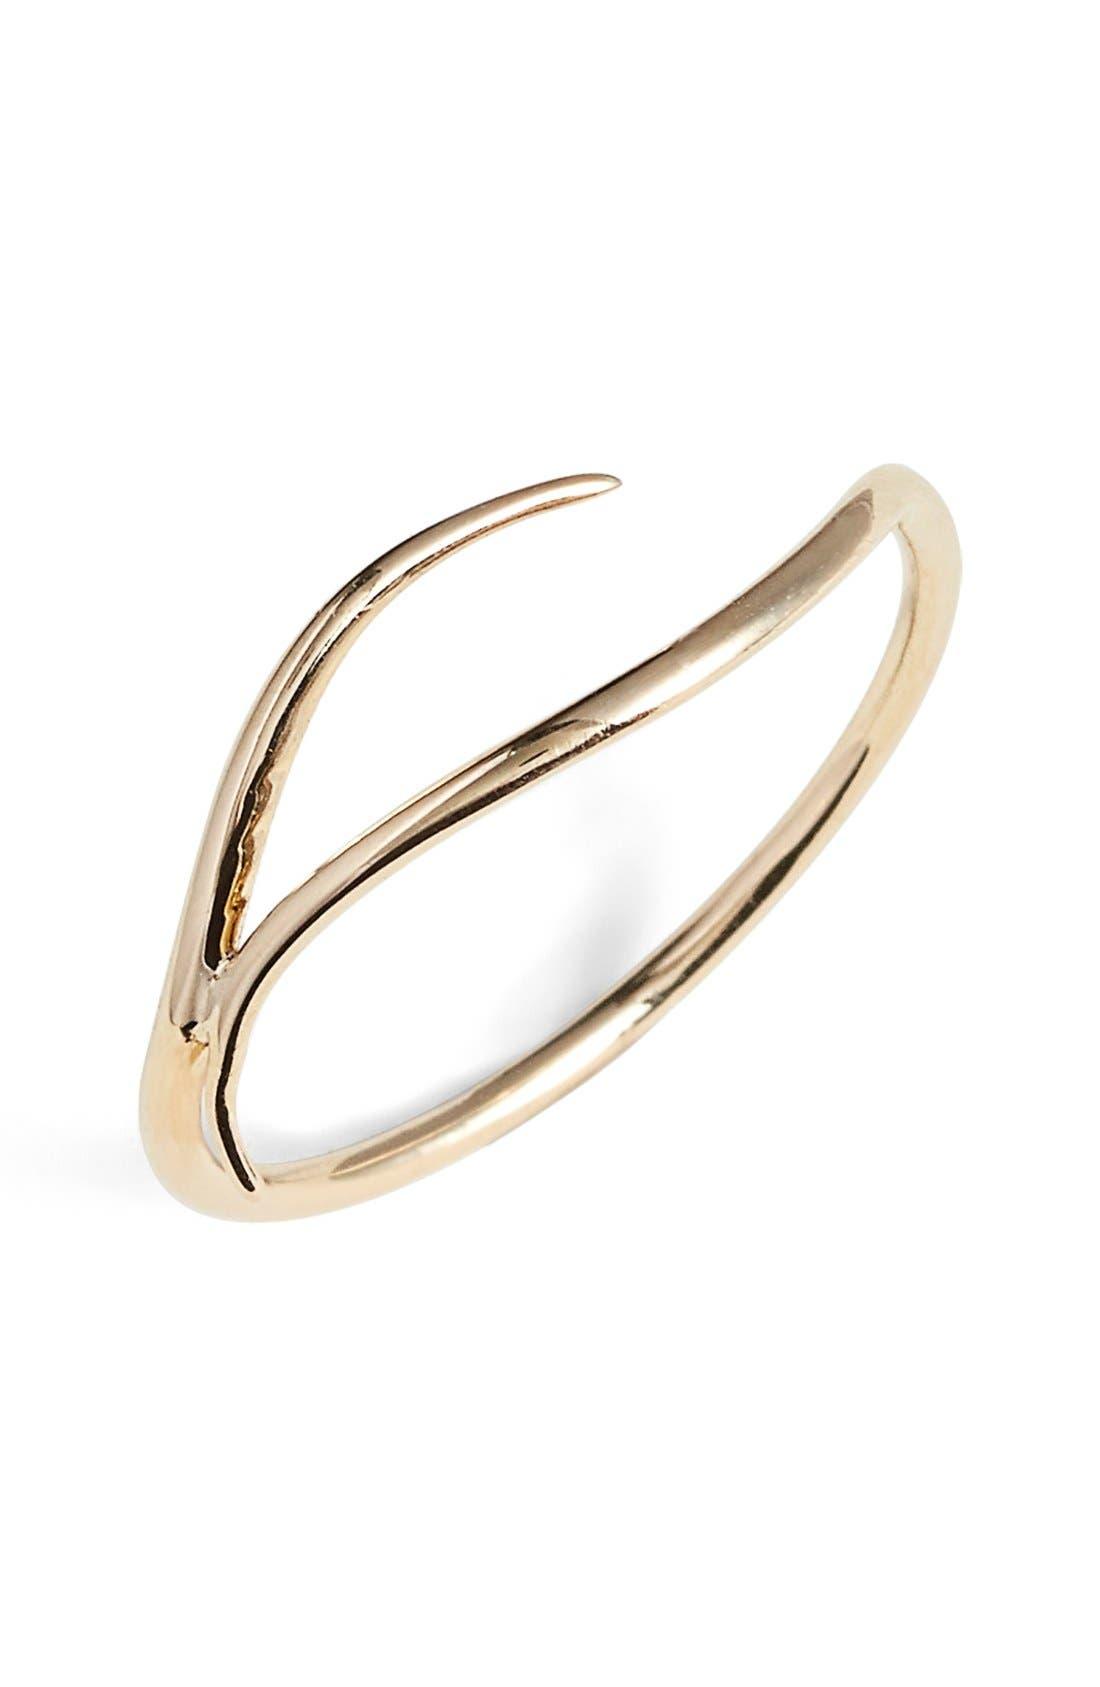 SARAH & SEBASTIAN 'Tenor' Gold Wave Ring